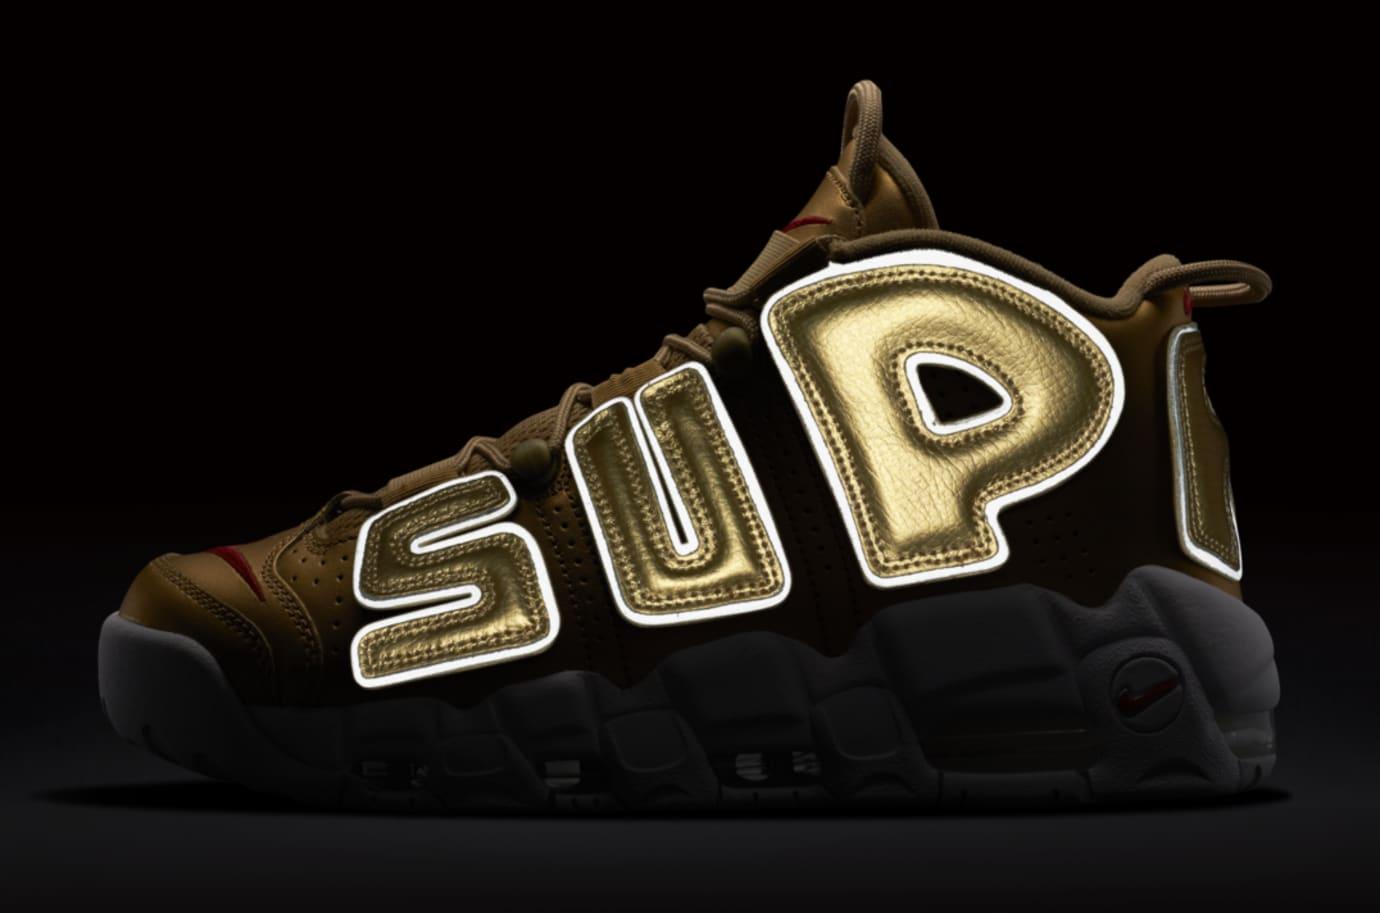 Gold Supreme Nike Air More Uptempo 902290-700 Reflective